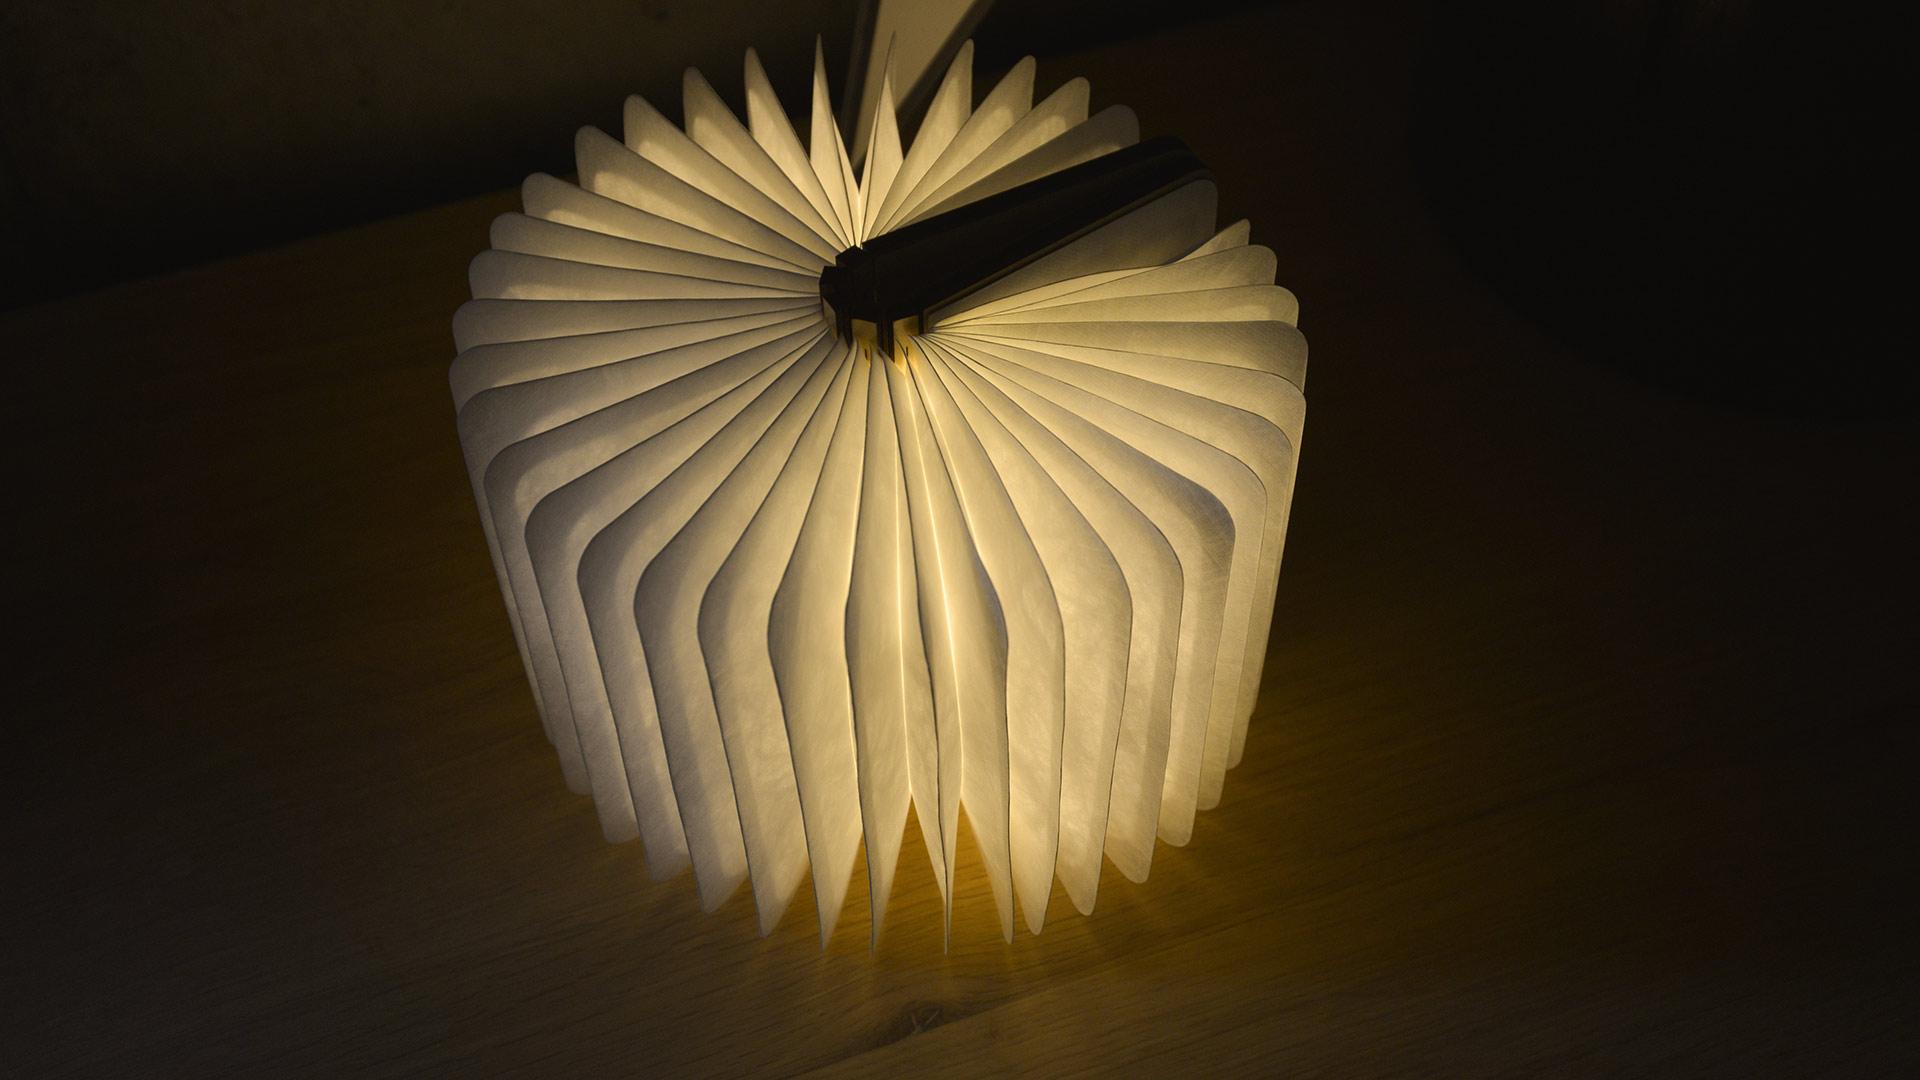 maple-book-light-open-360